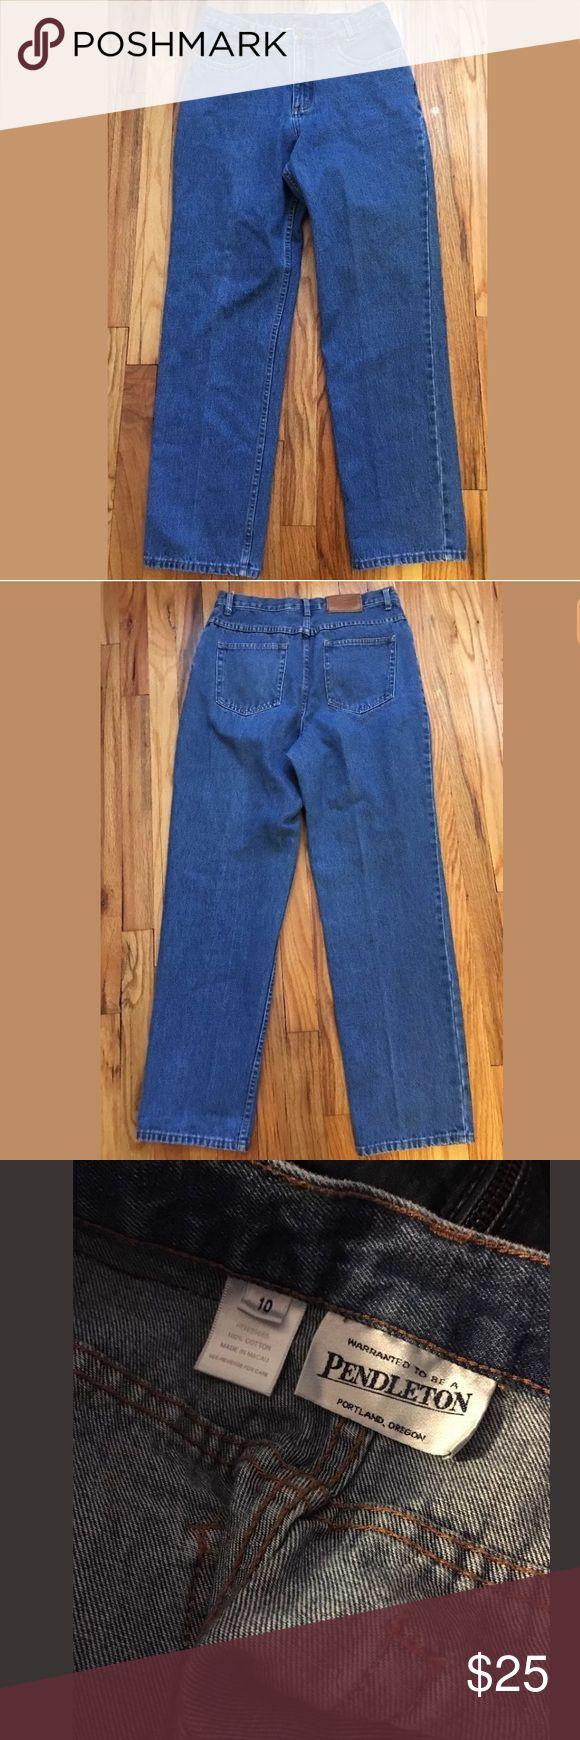 "VTG Pendleton Womens Denim jeans sz 10 VINTAGE PENDLETON WOMENS JEANS! SZ 10 100% COTTON EXCELLENT CONDITION! Measurements taken while lying flat: _ (DOUBLE WAIST) Waist, across - 15"" (30"") Inseam - 31"" Front rise - 11"" Pendleton Jeans Straight Leg"